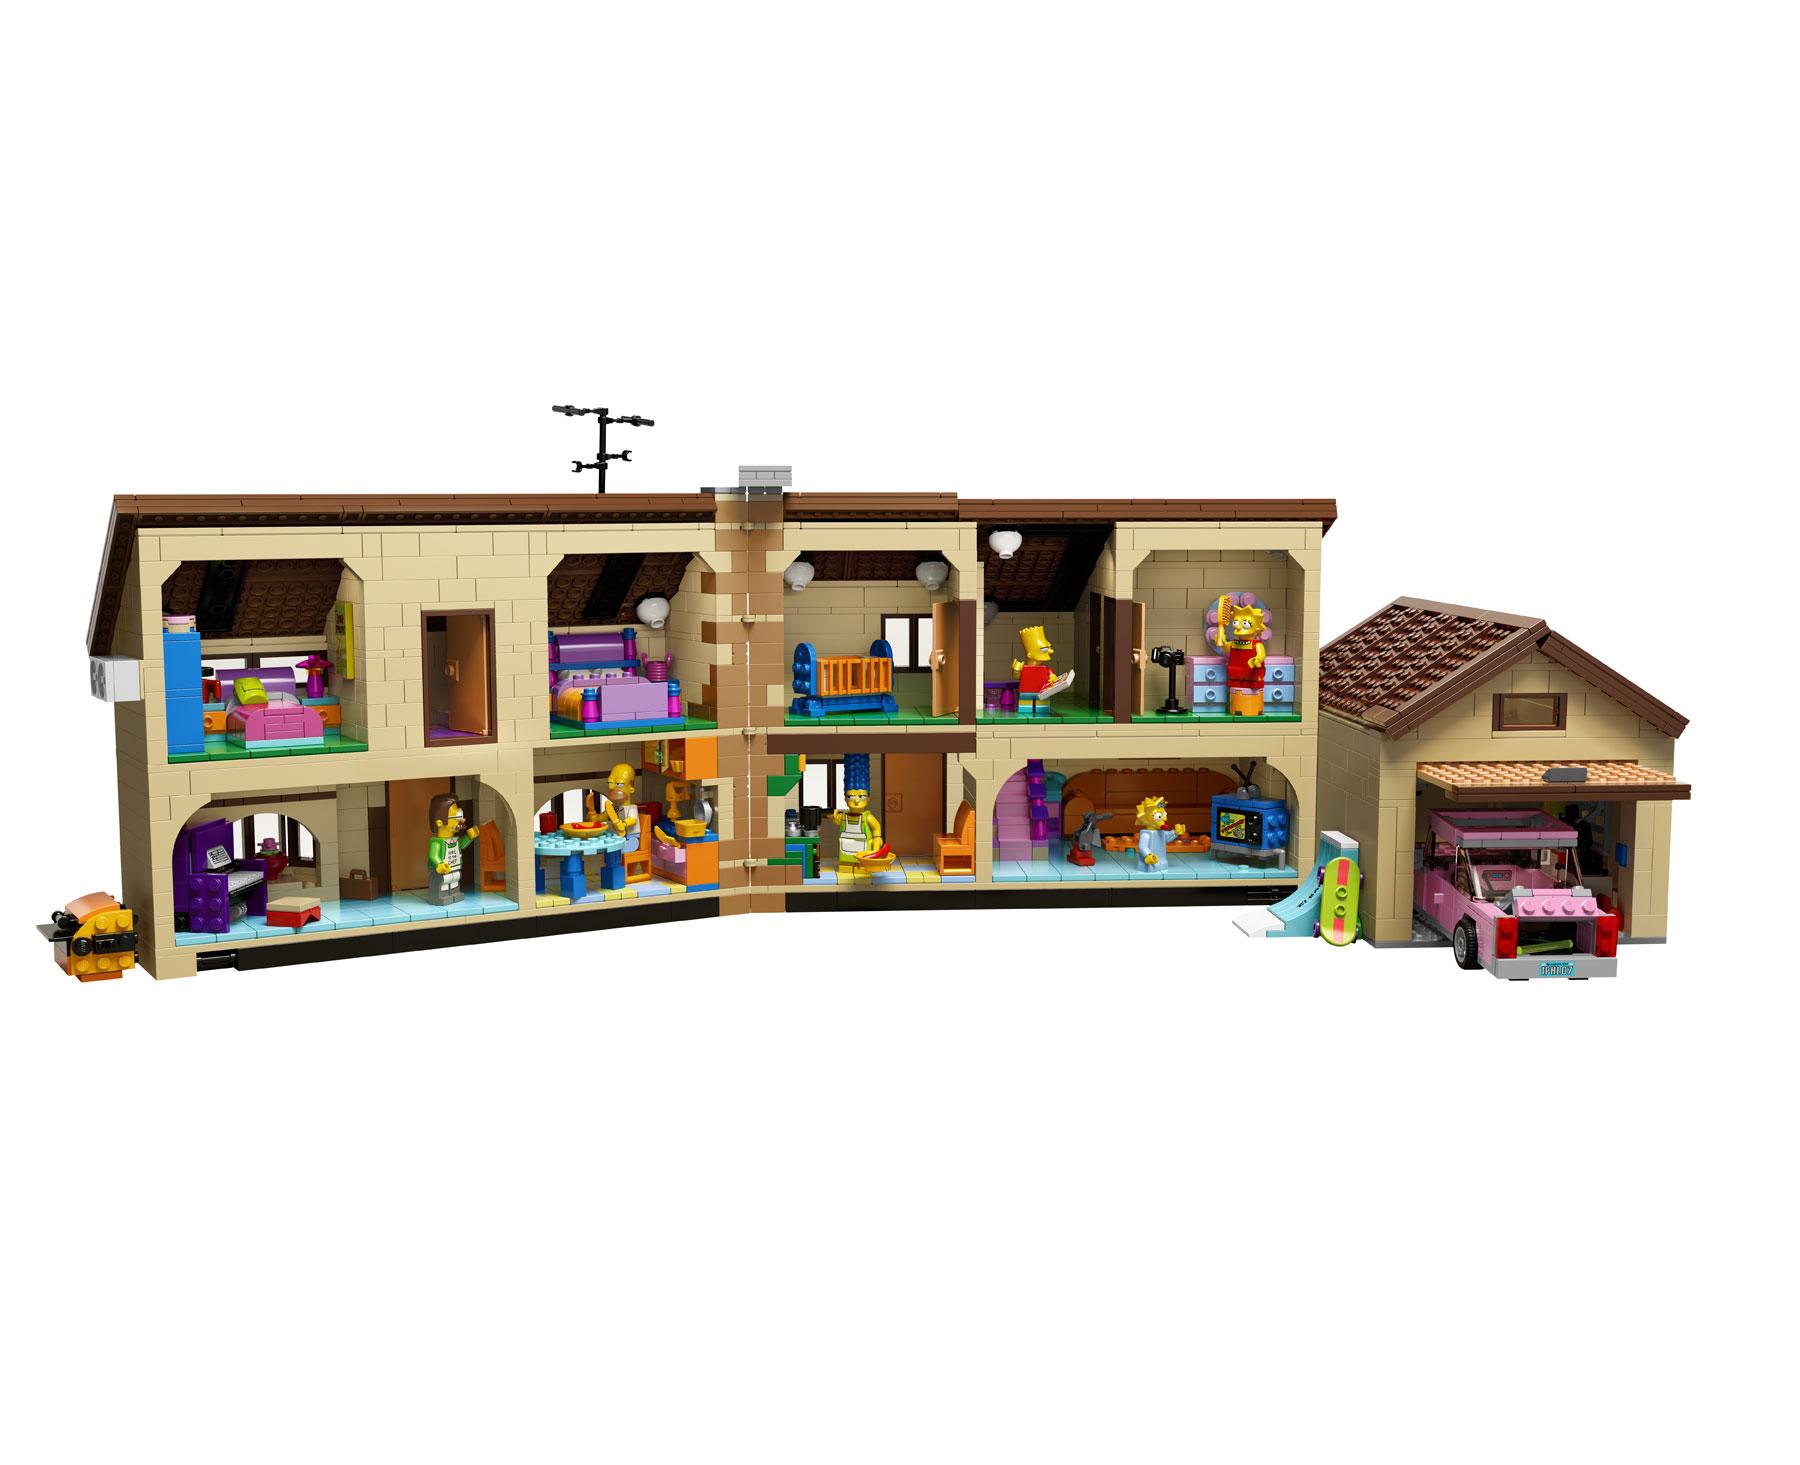 LEGO Reveals 71006 The Simpsons House - FBTB